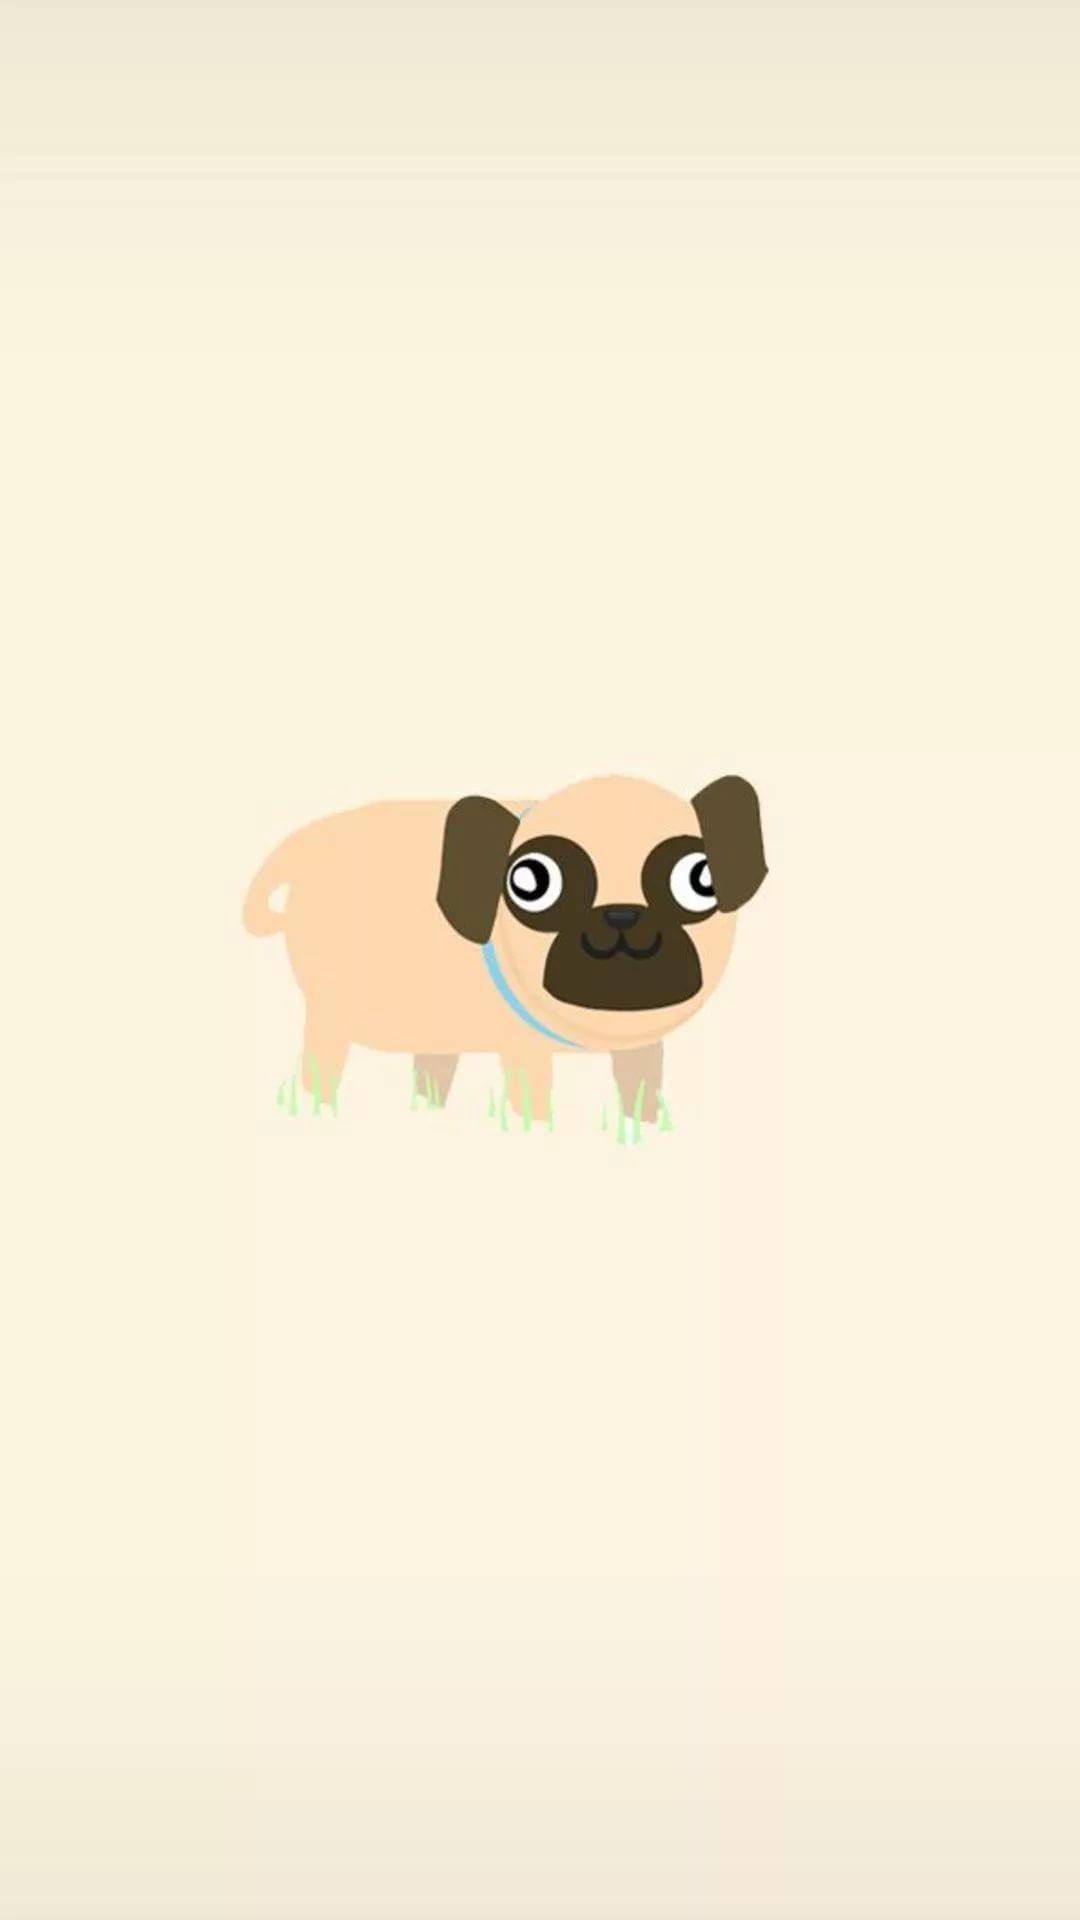 Pug iPhone wallpaper